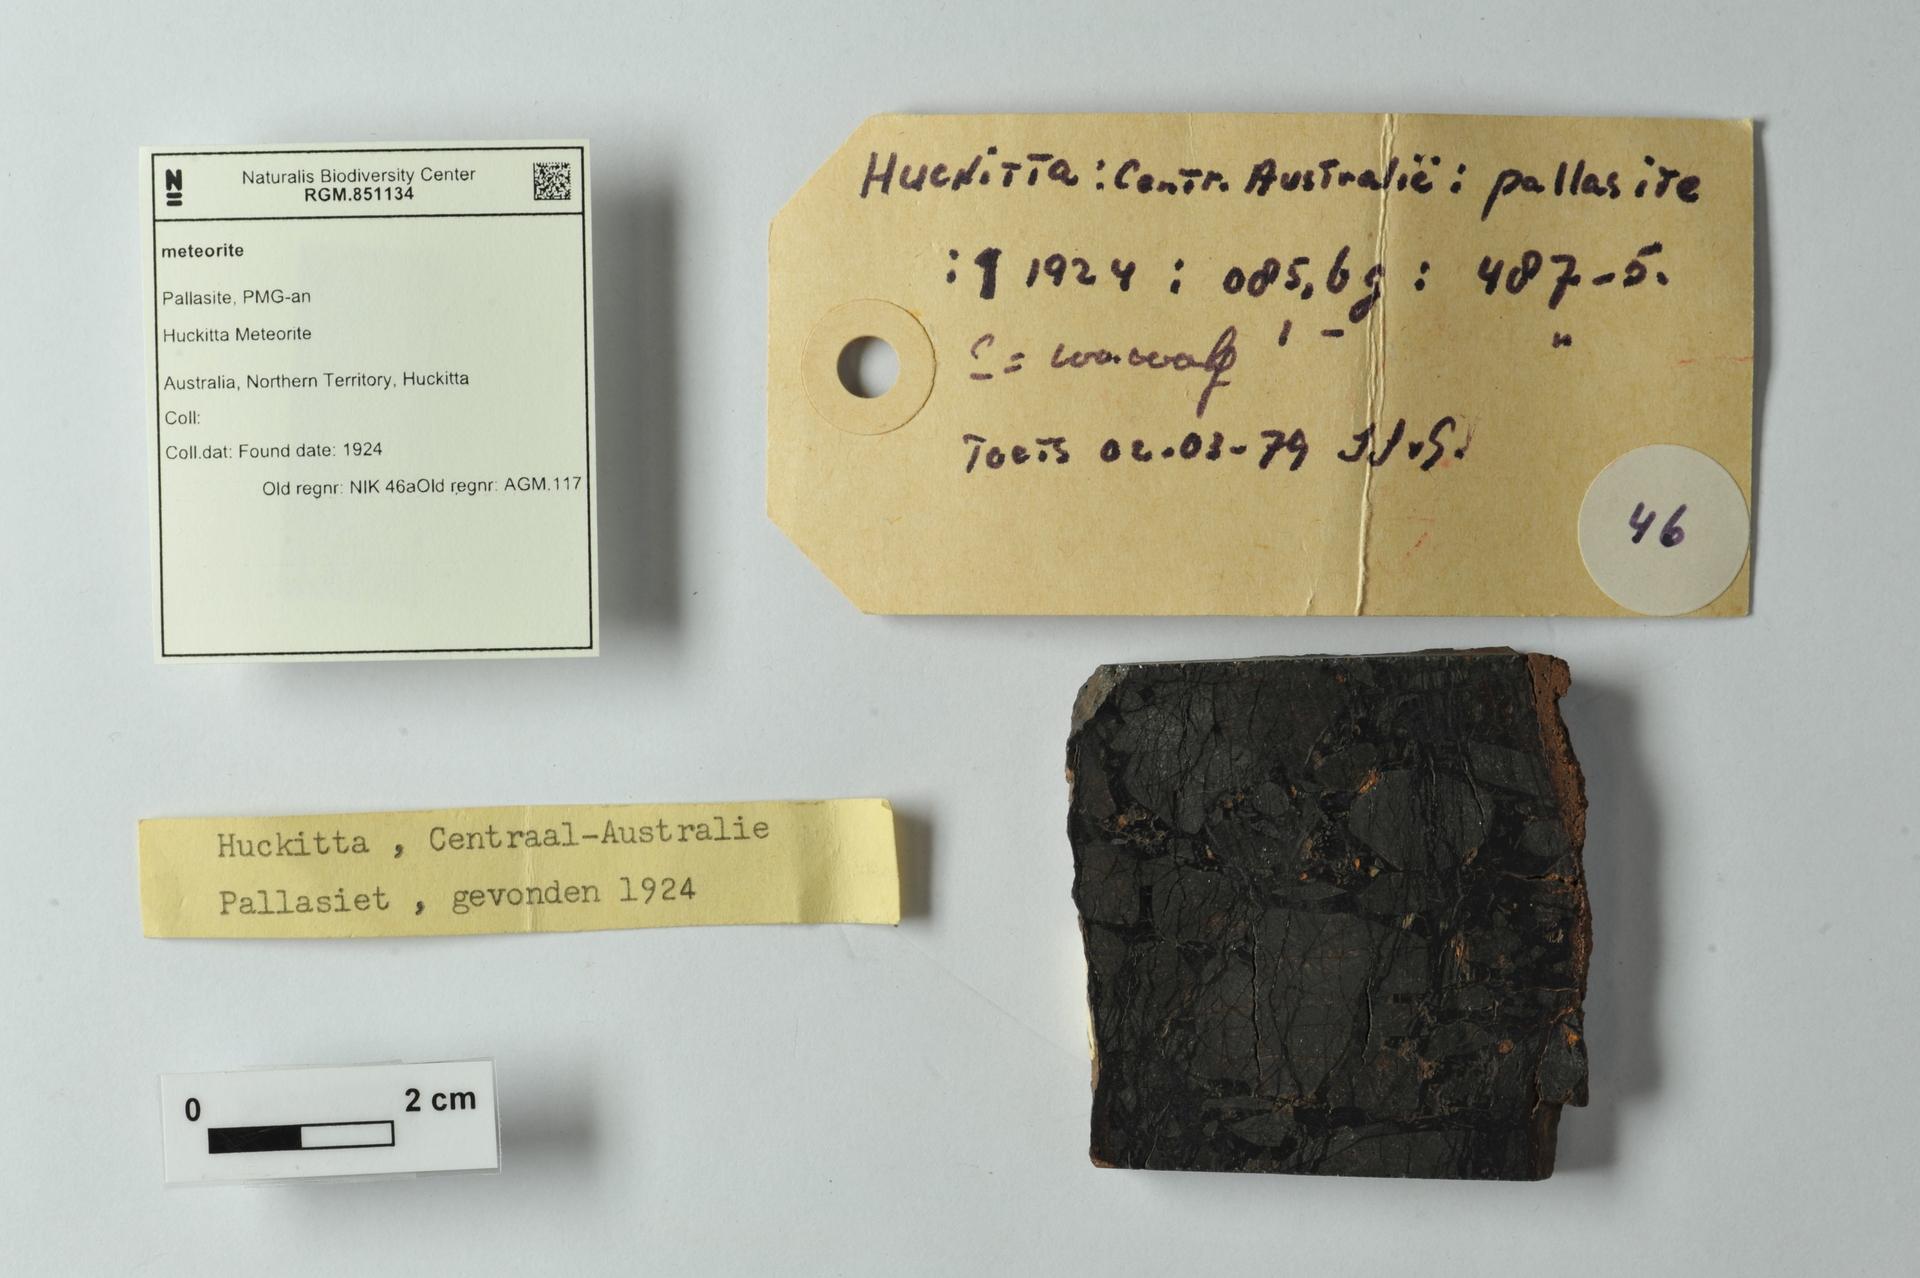 RGM.851134 | Pallasite, PMG-an